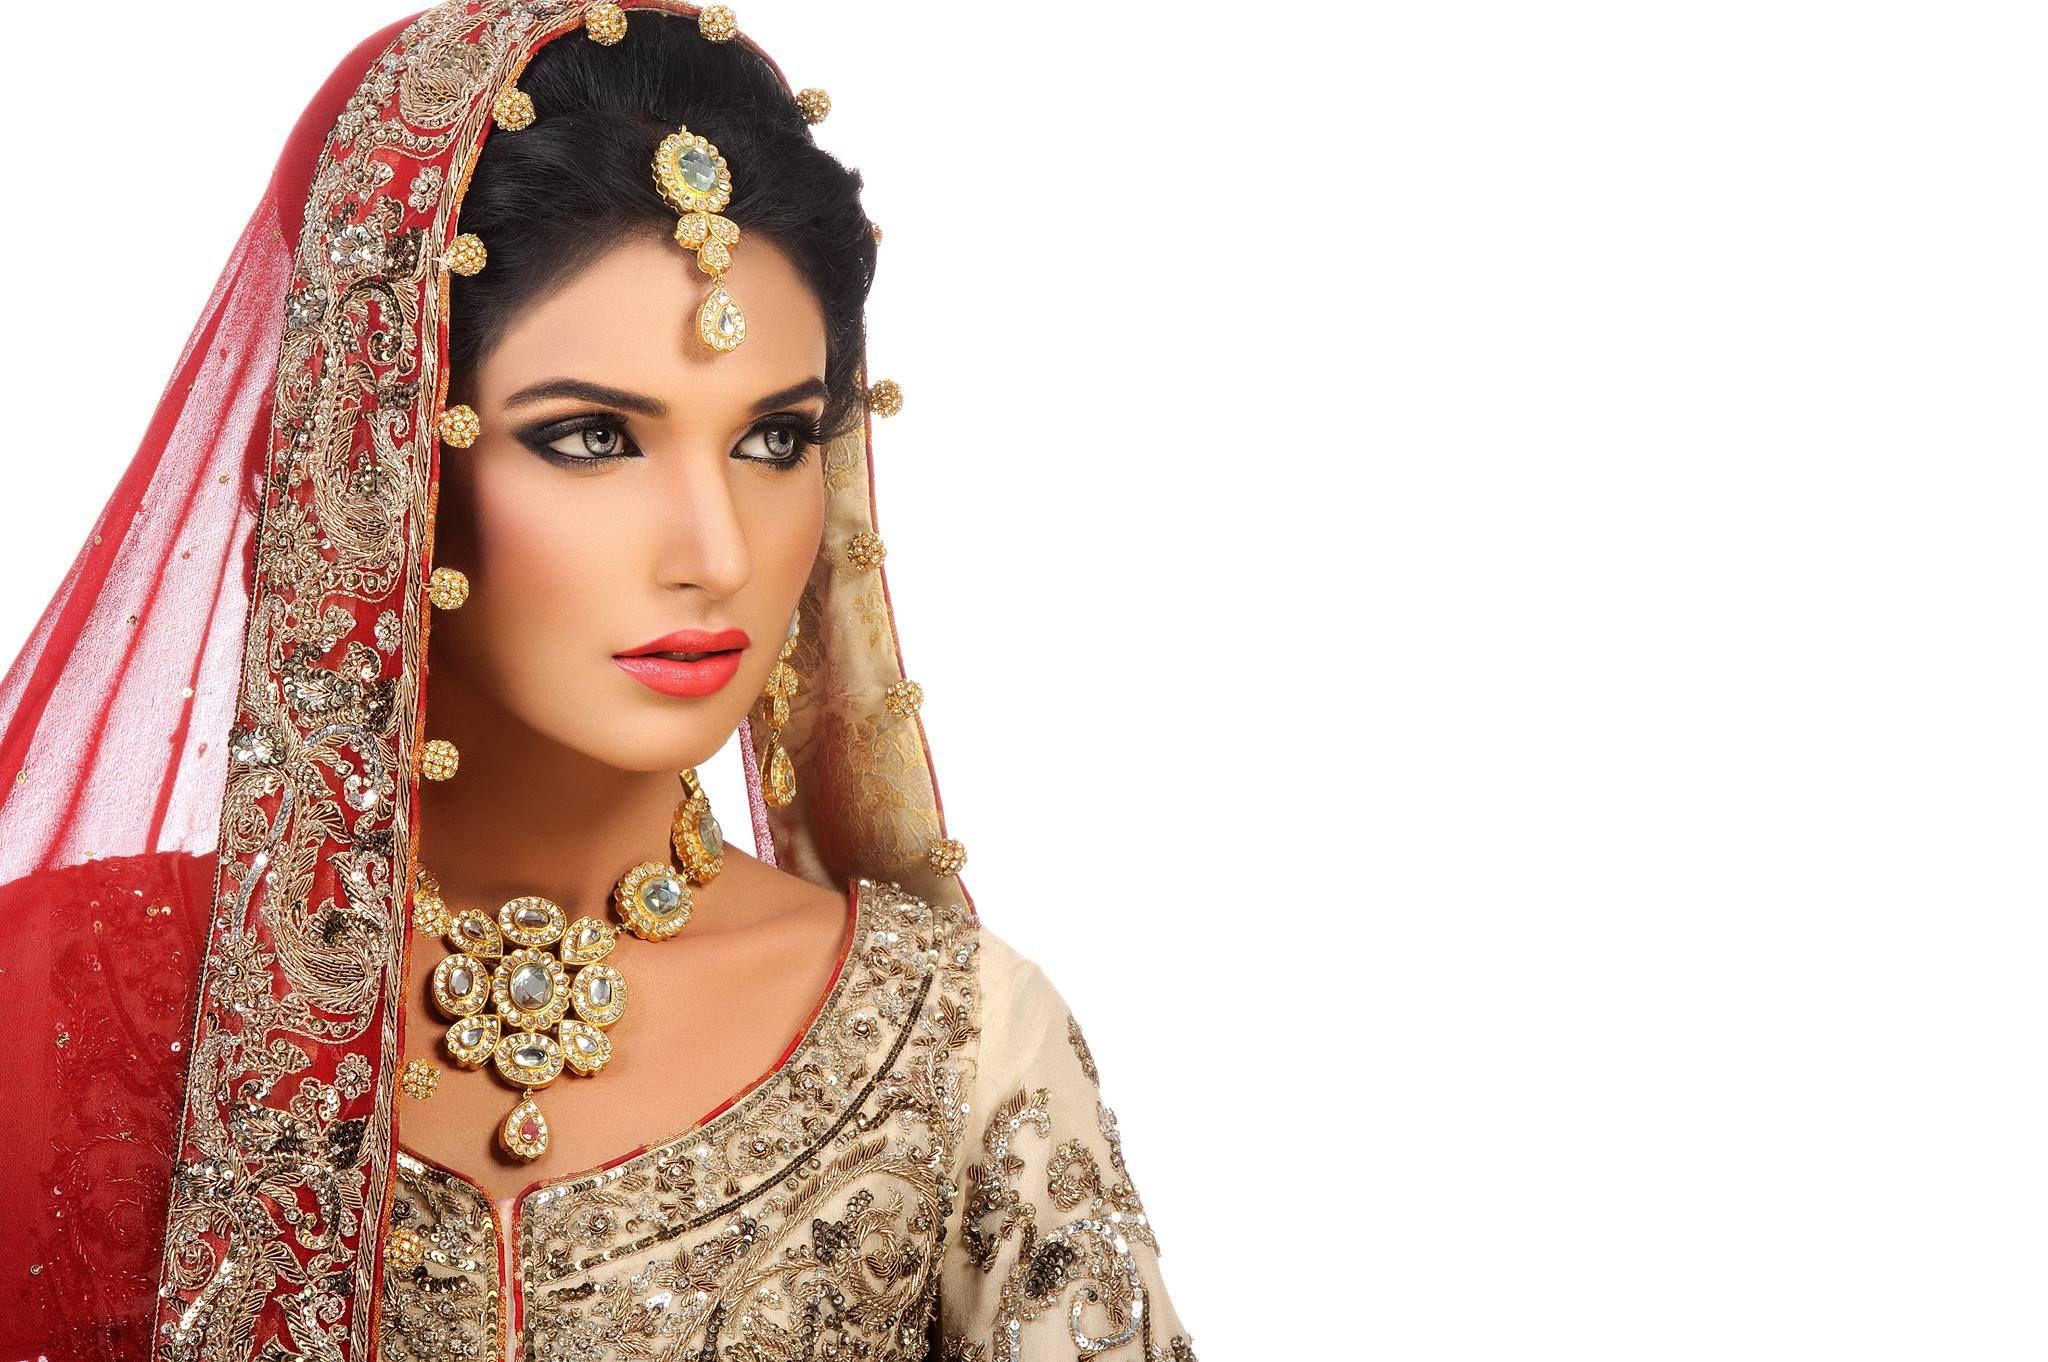 Pin by shaista ch on Bridal makeup | Pinterest | Bridal makeup ...